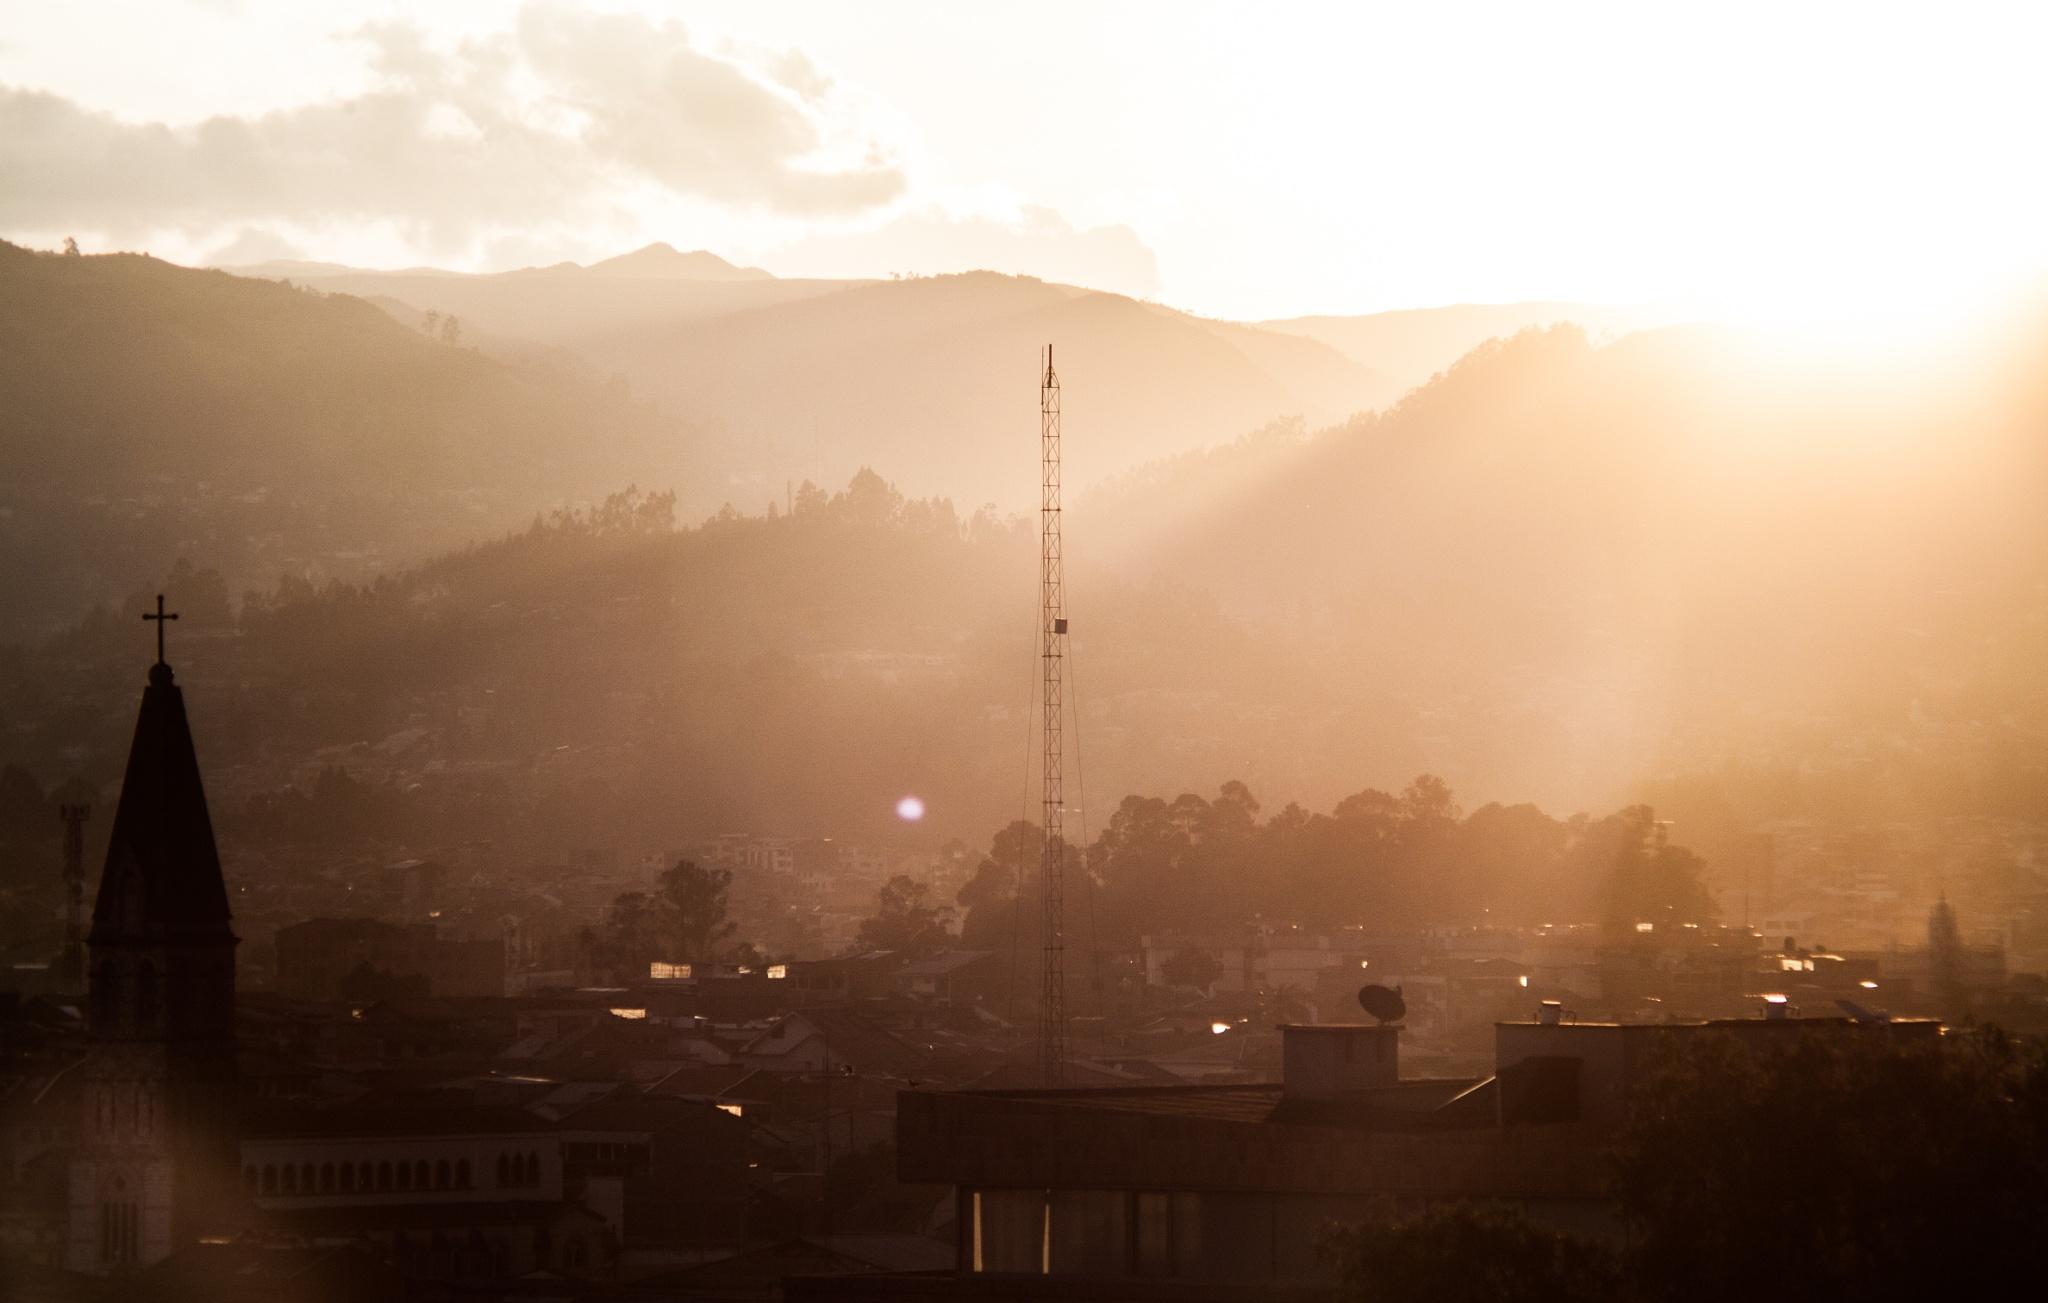 Atardecer en Cuenca - Ecuador by Roy Santiago Calle